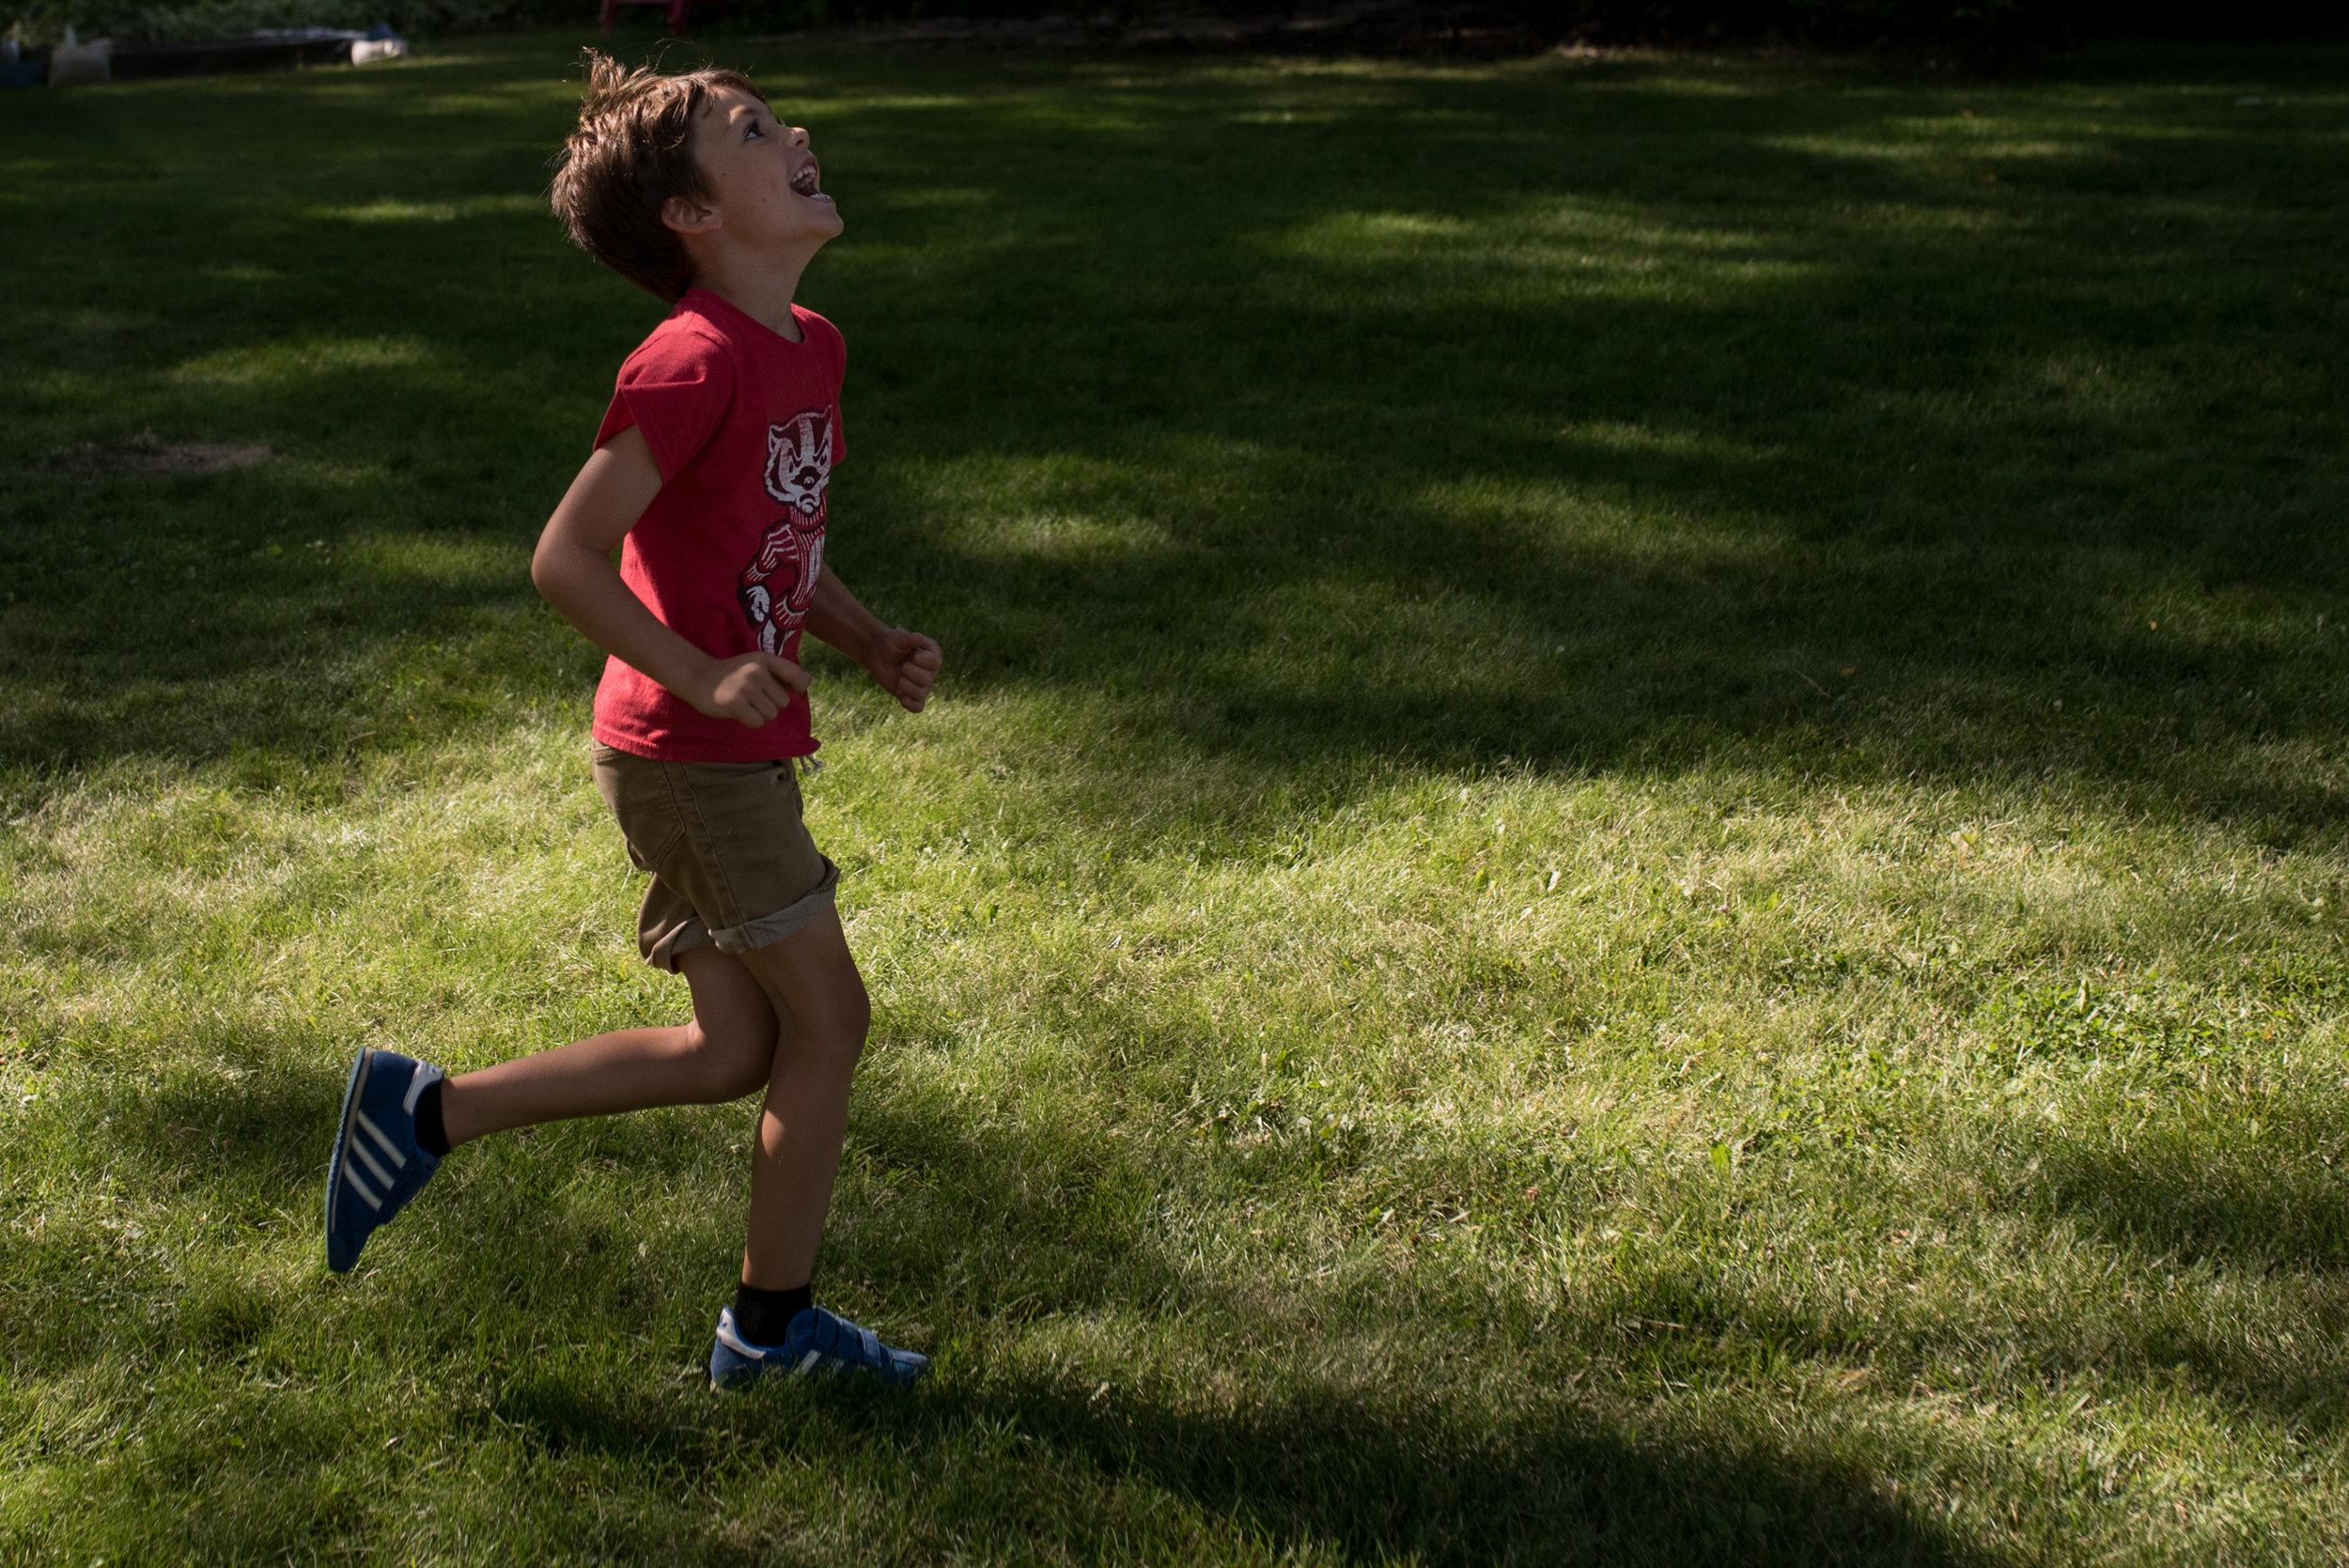 boy running in yard